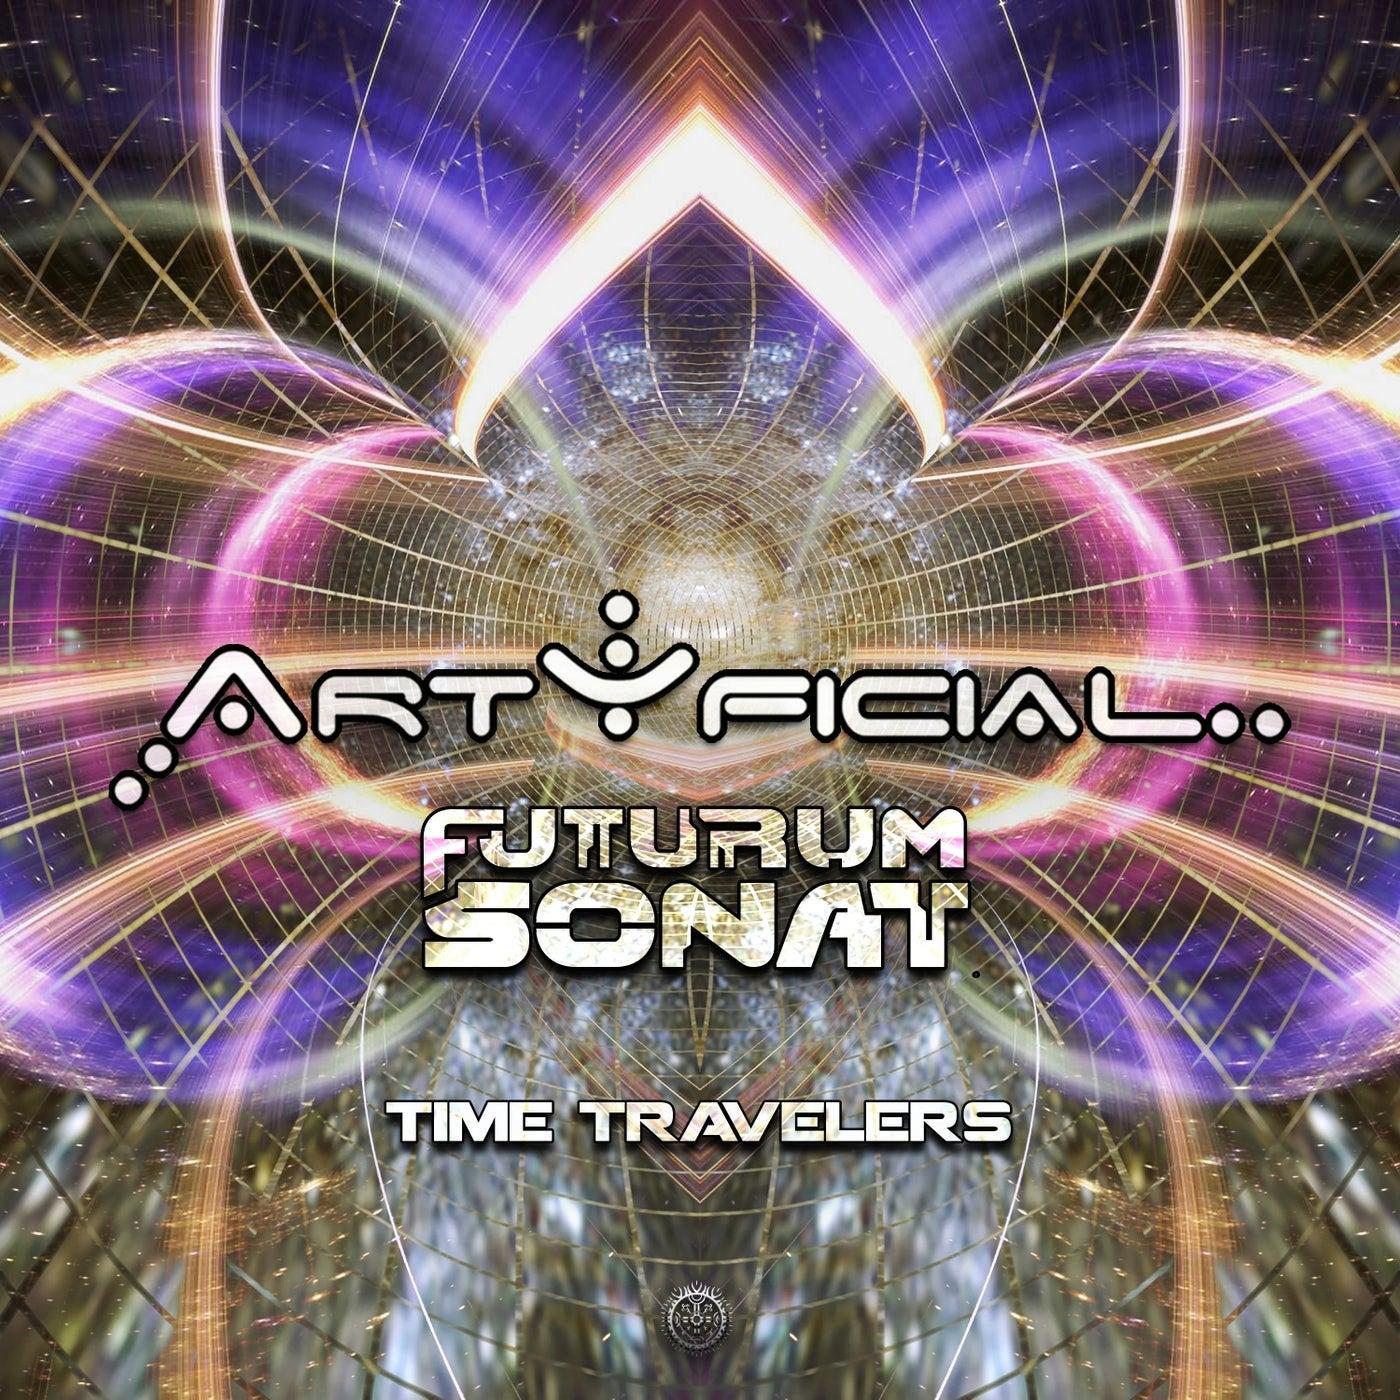 Time Travelers (Original Mix)